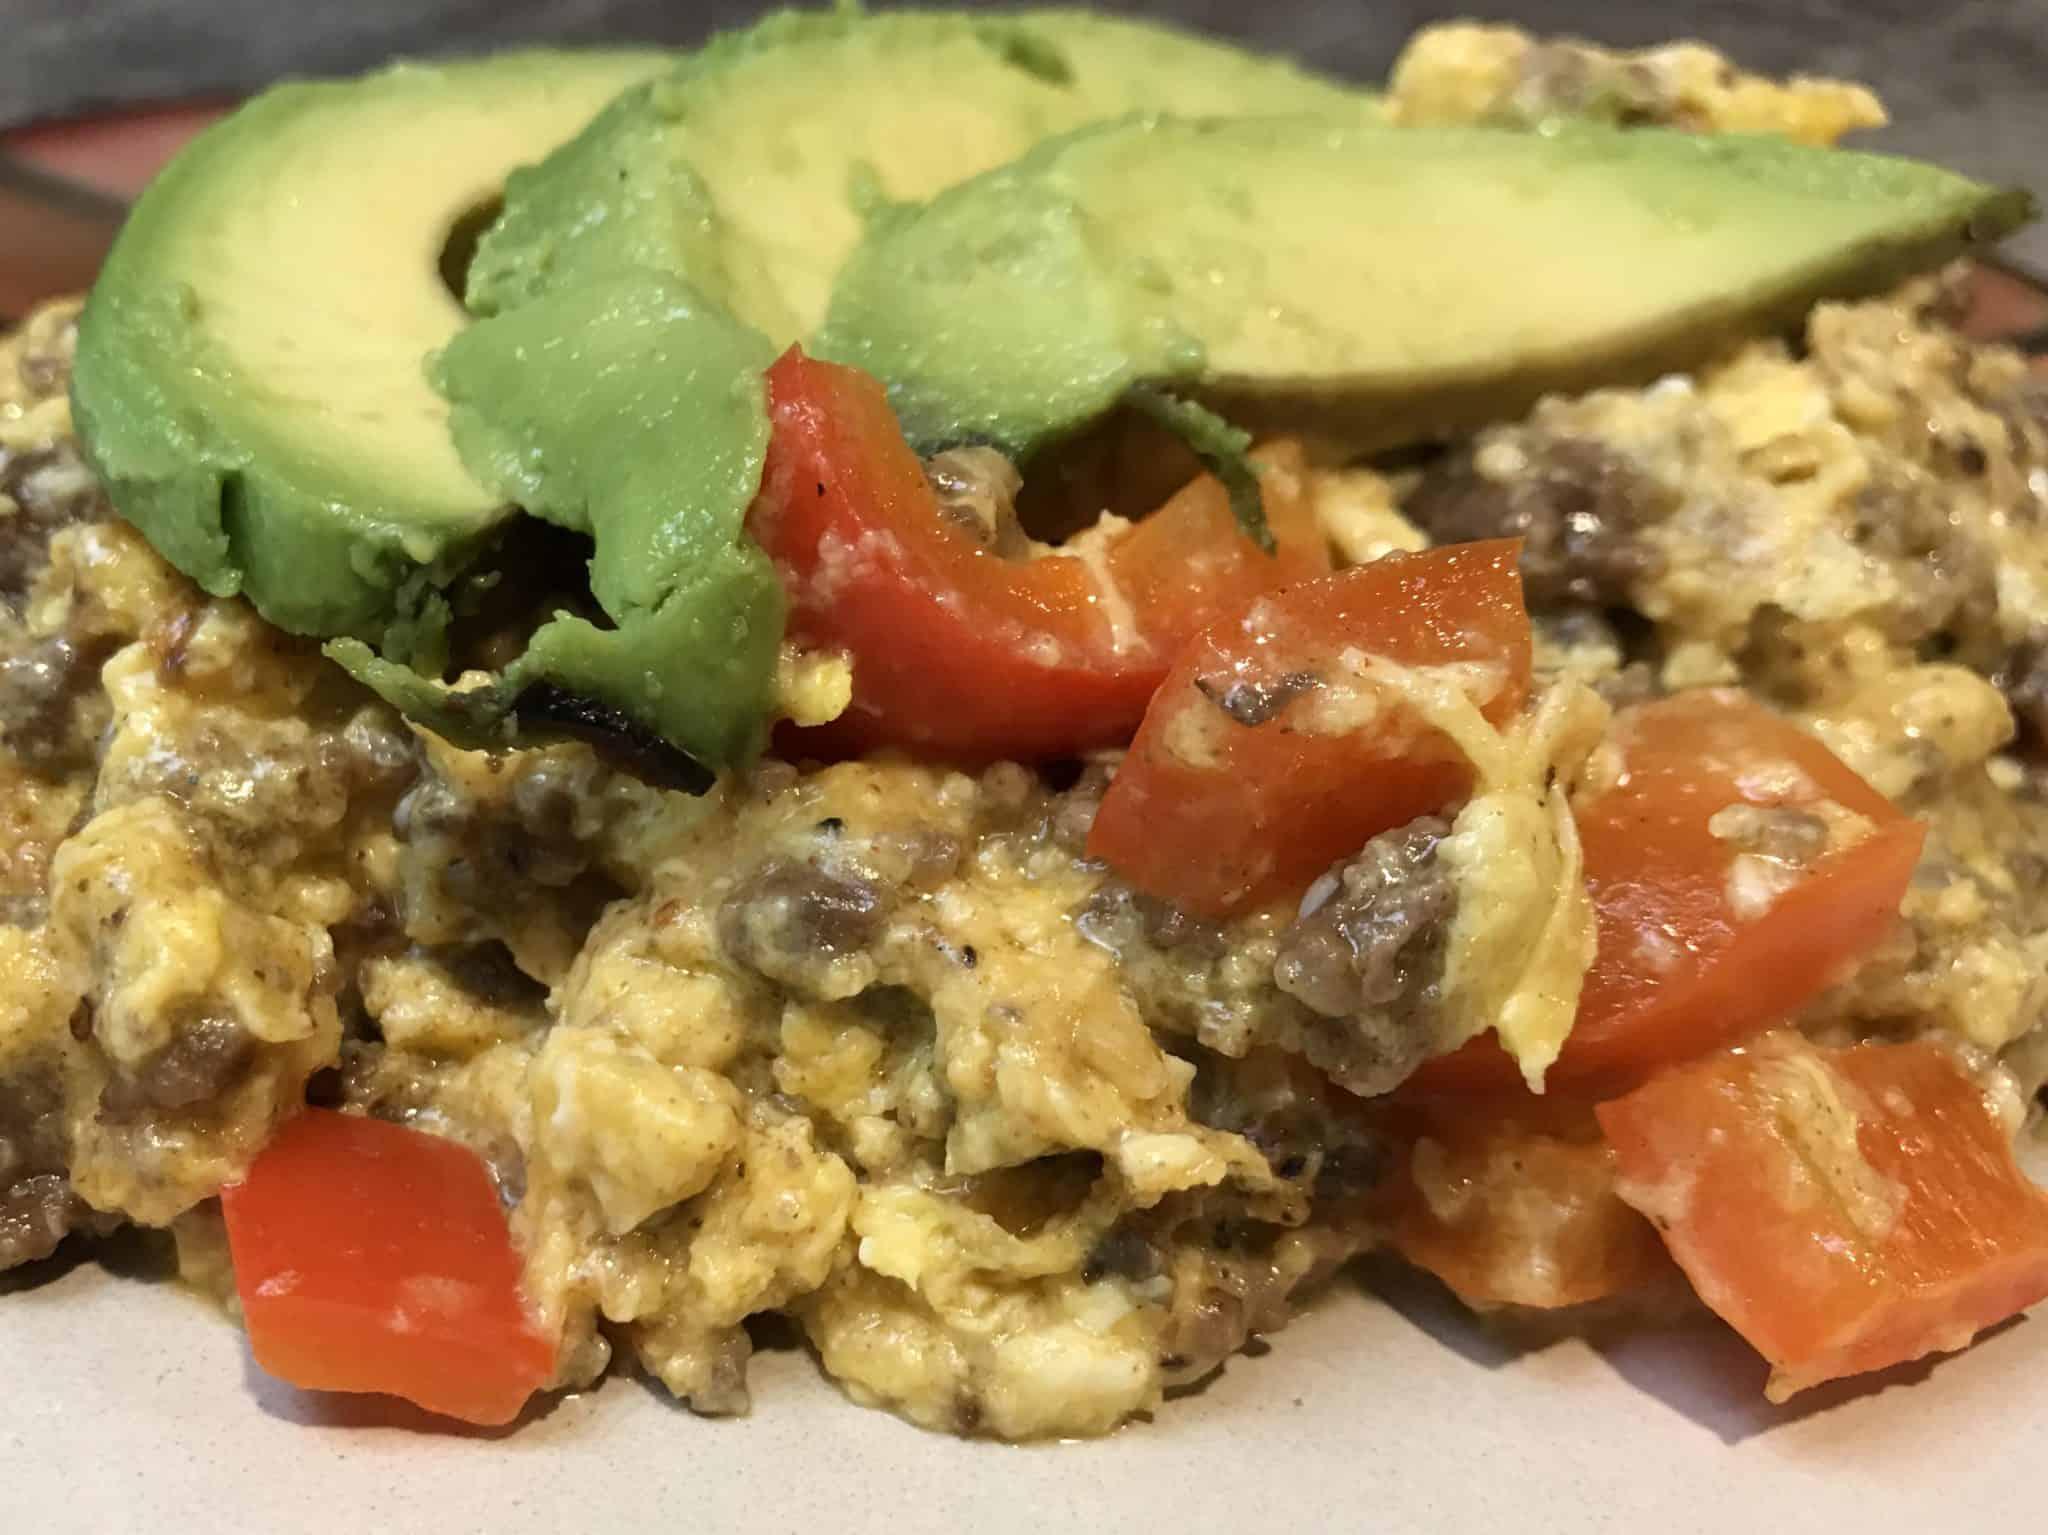 Keto Southwestern Skillet Breakfast